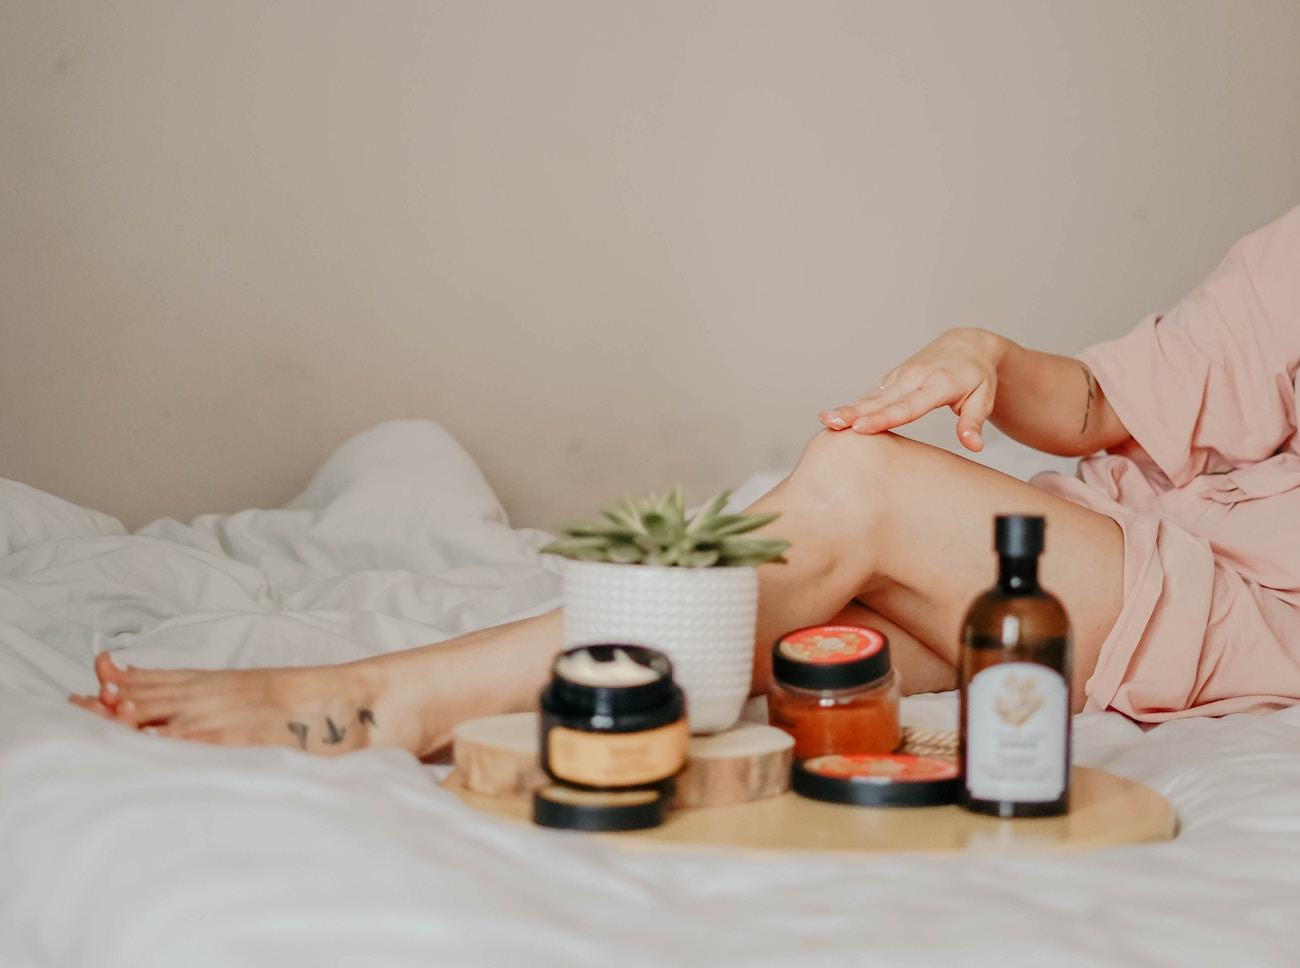 Massage - Unsplash - Toa Heftiba